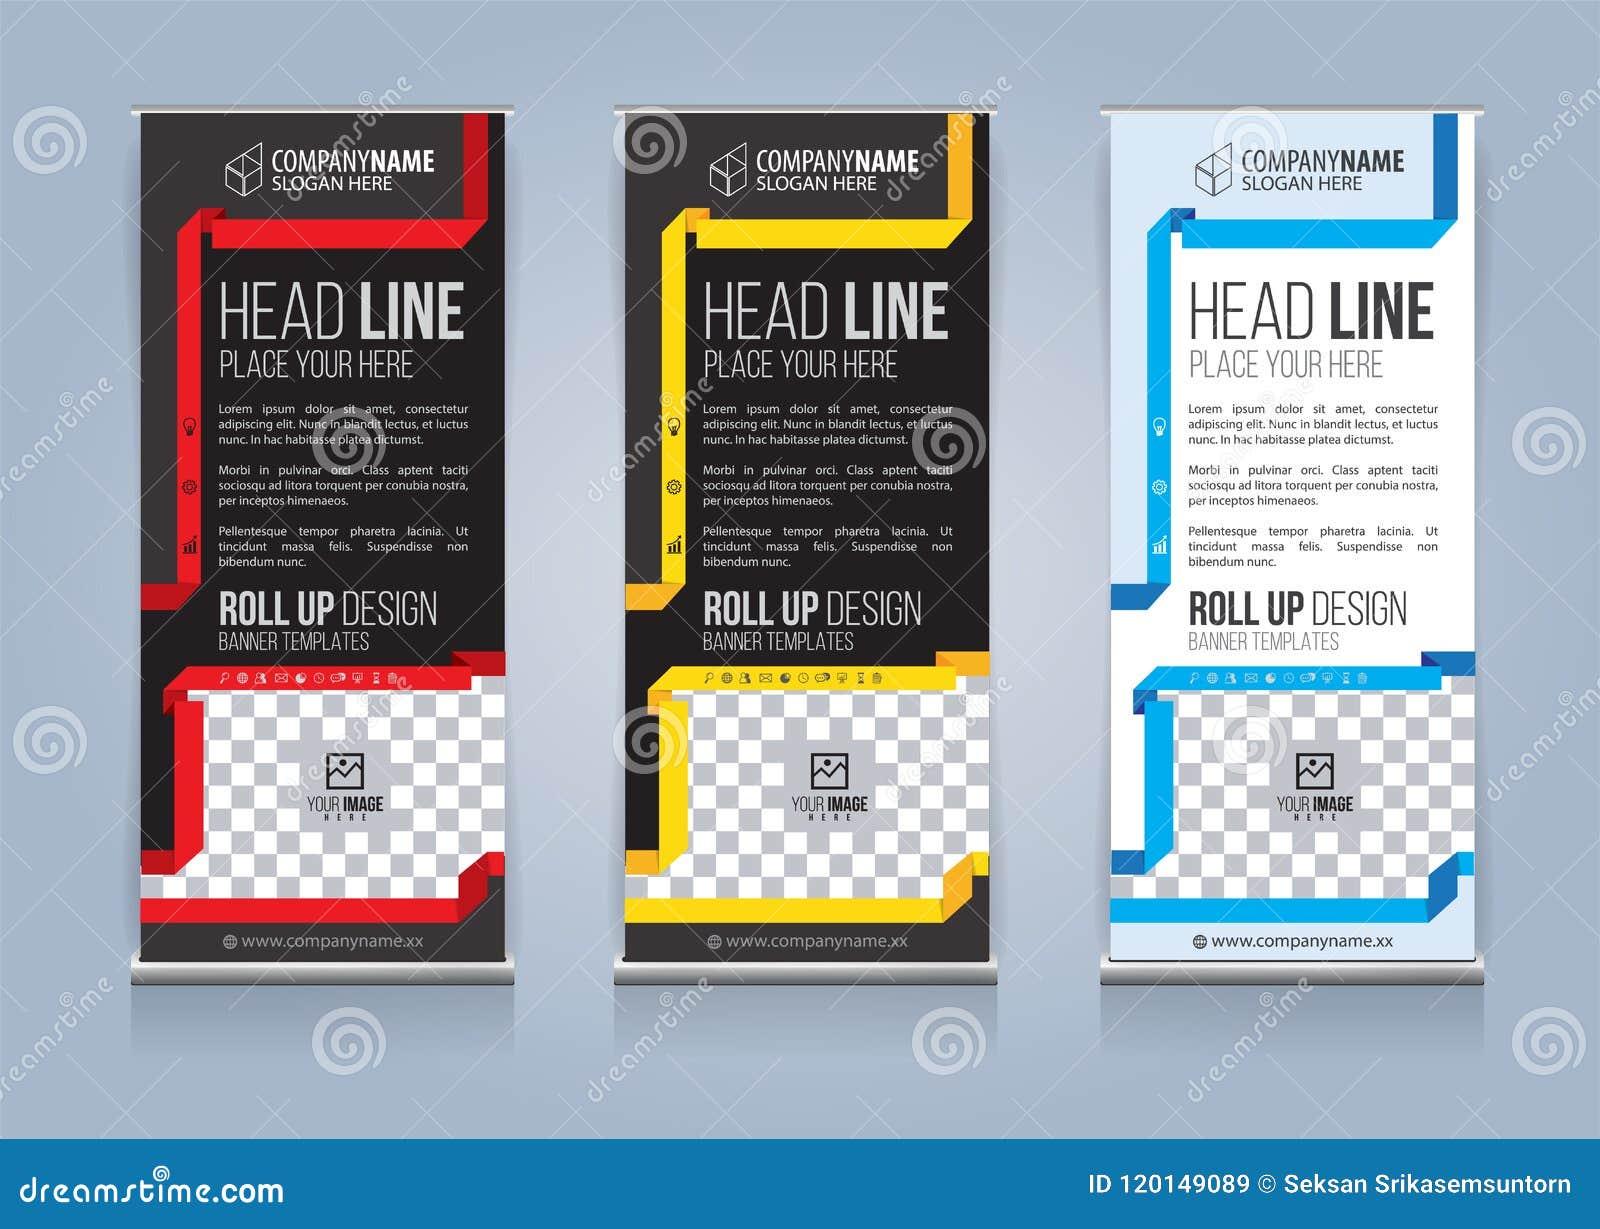 Roll Up Banner Template Design Vector Illustration